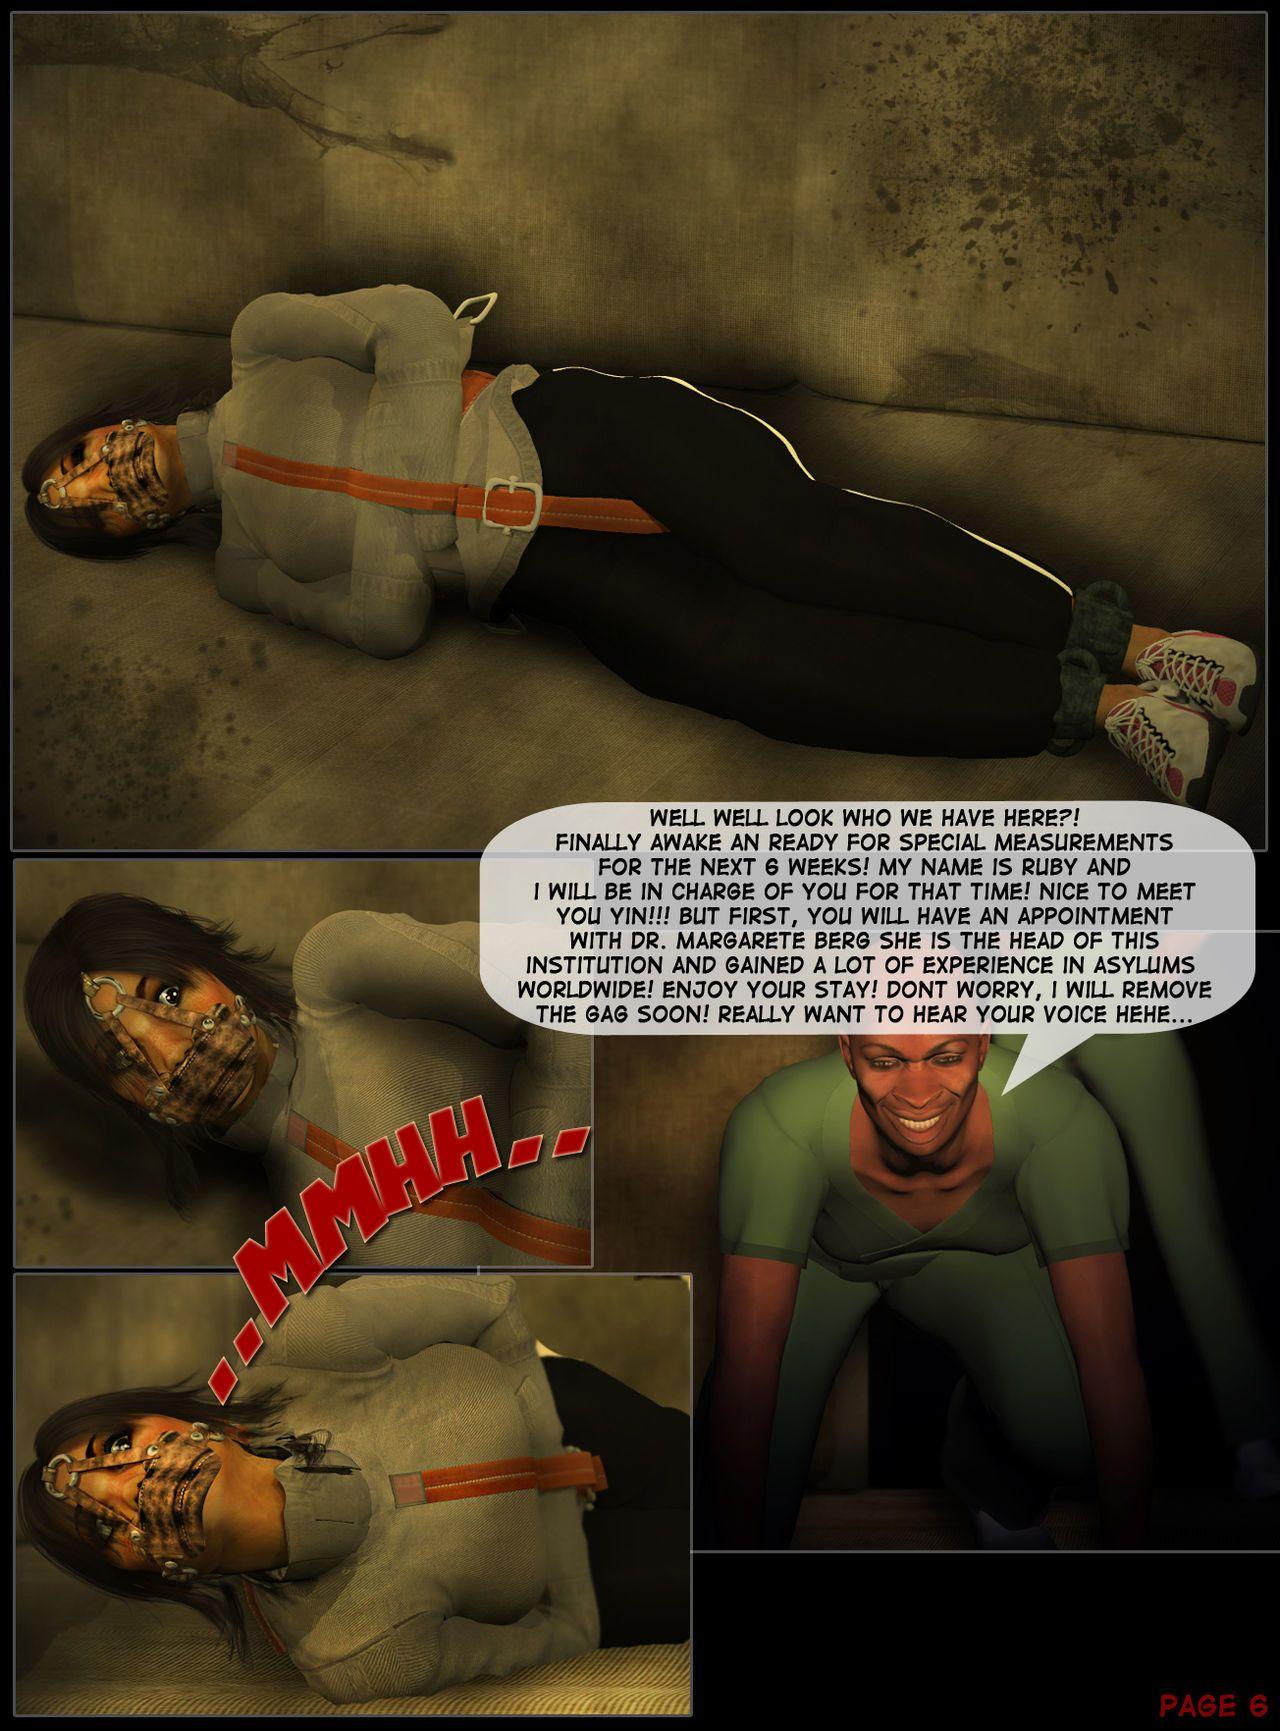 The Asylum of Dr. Berg